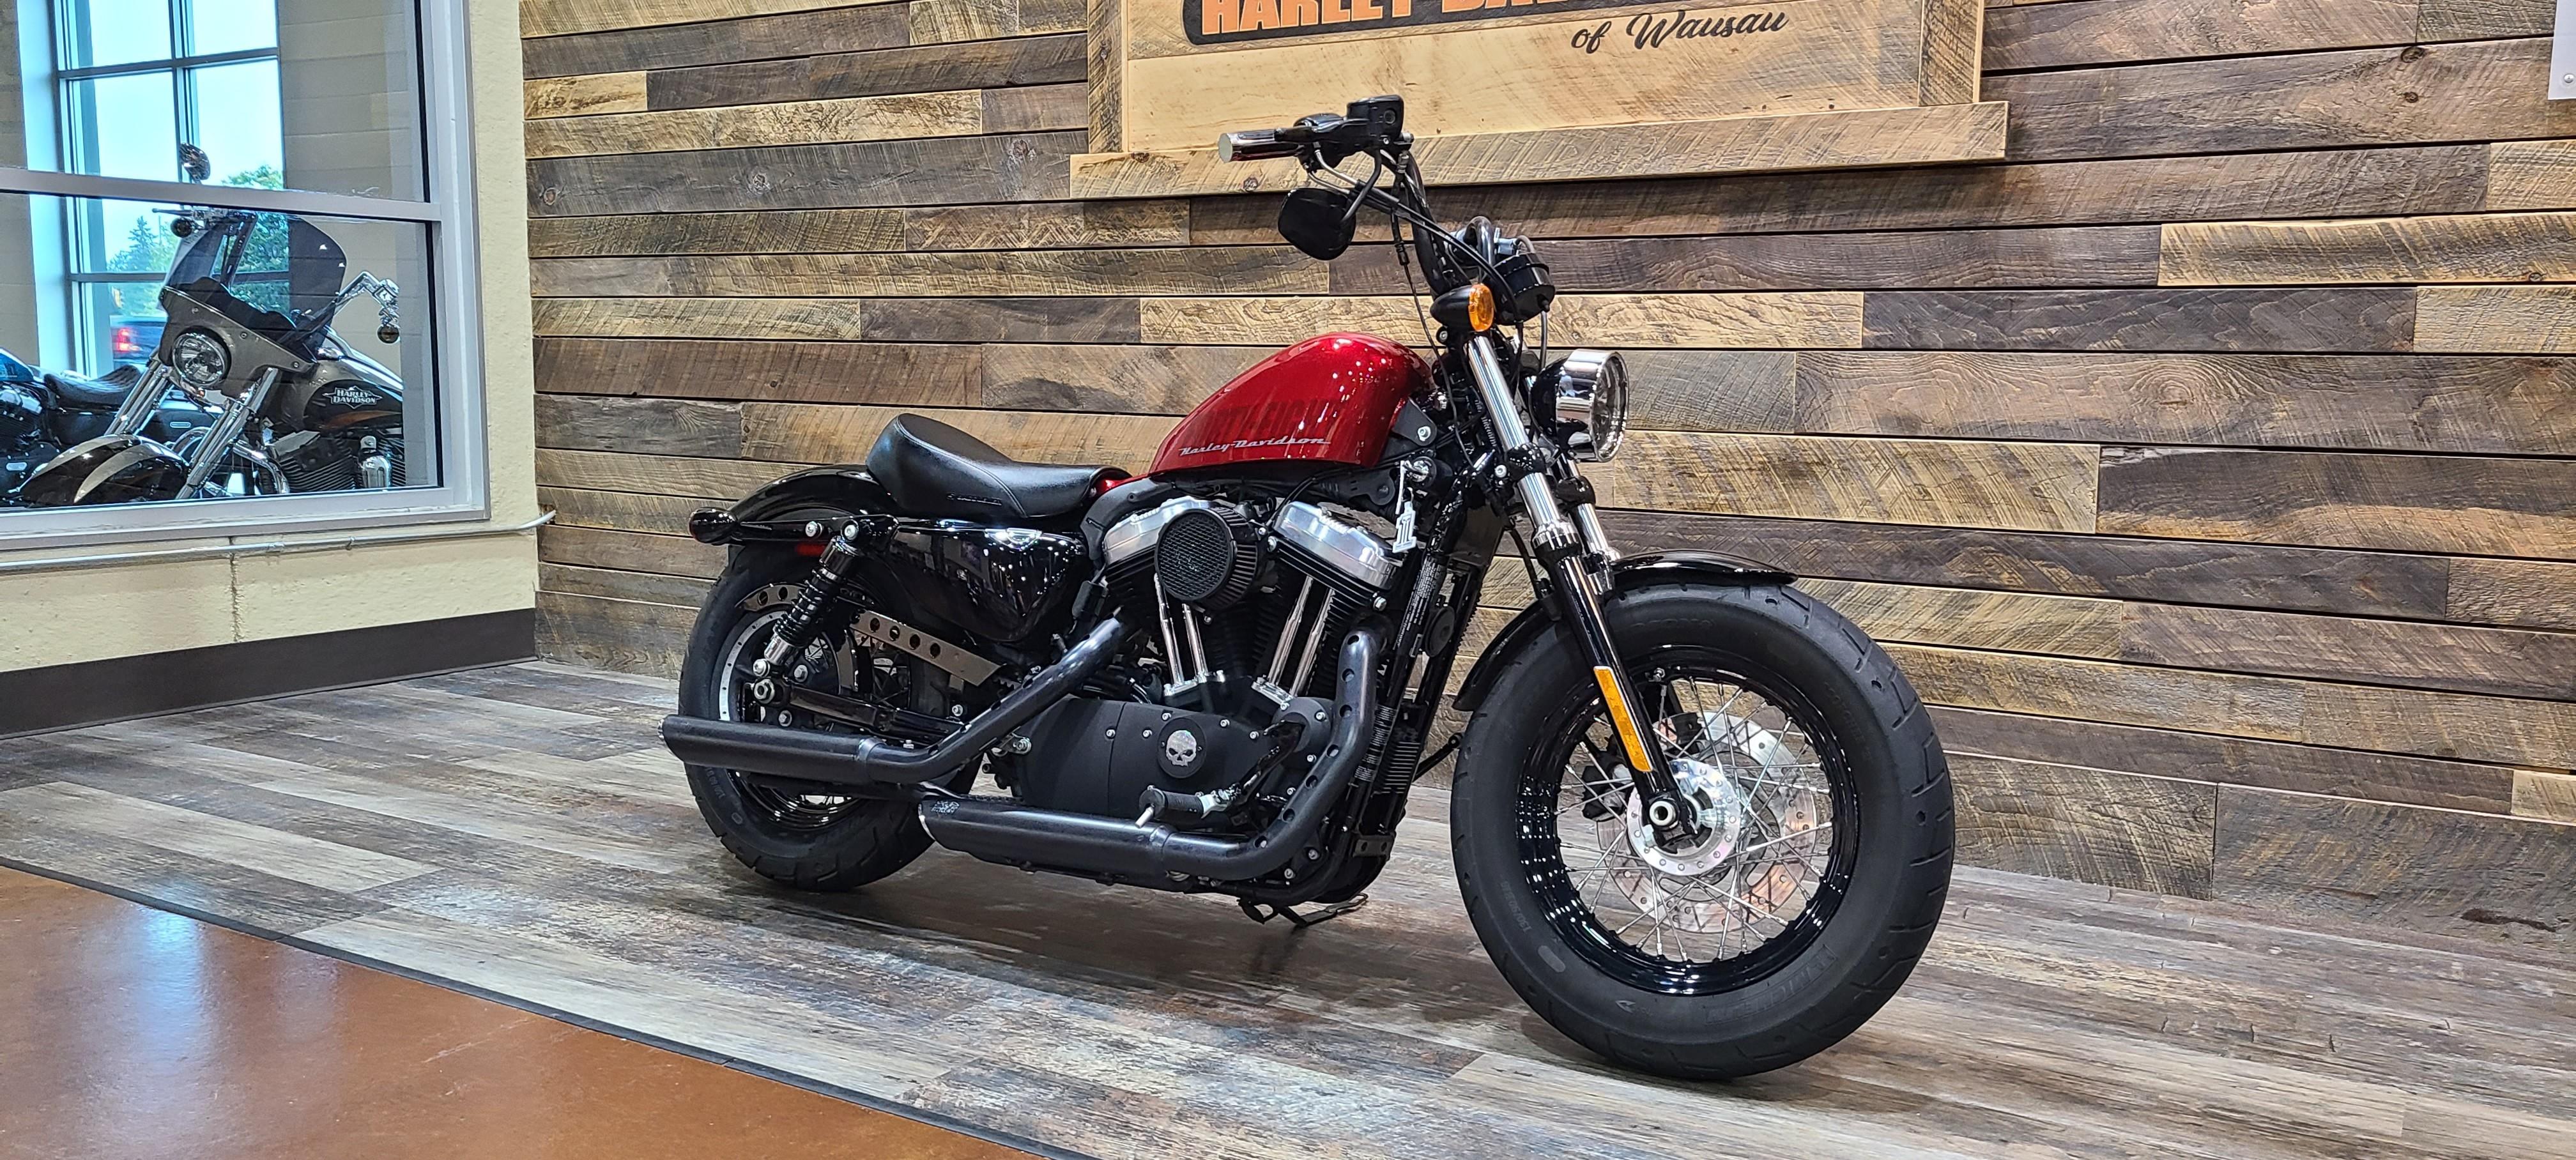 2012 Harley-Davidson Sportster Forty-Eight at Bull Falls Harley-Davidson